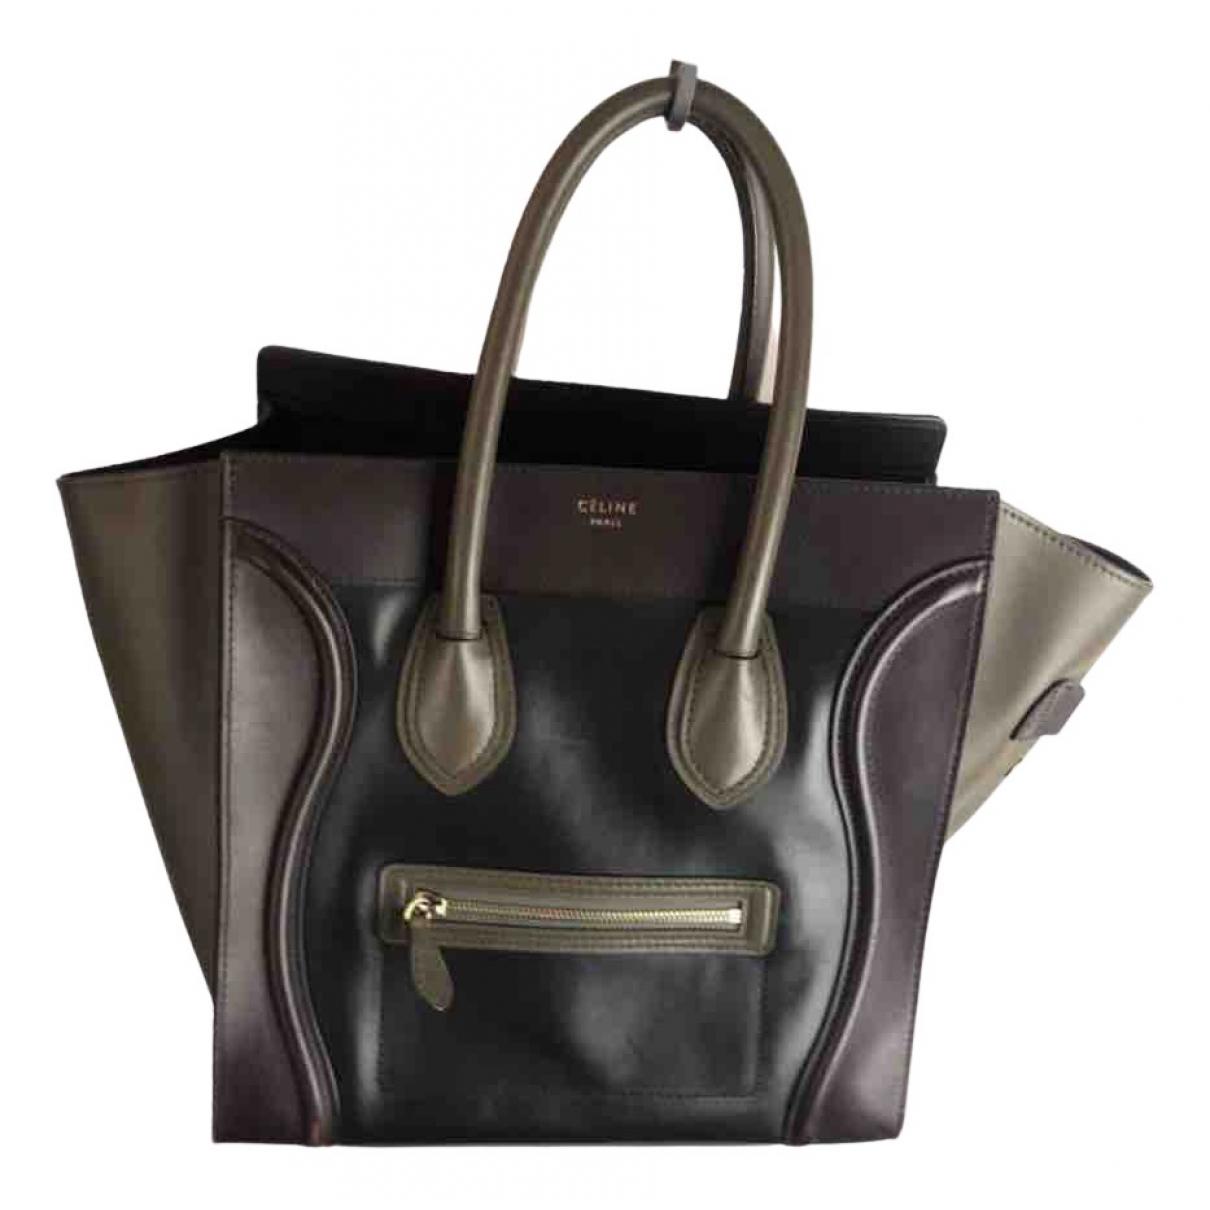 Celine Luggage Brown Leather handbag for Women N